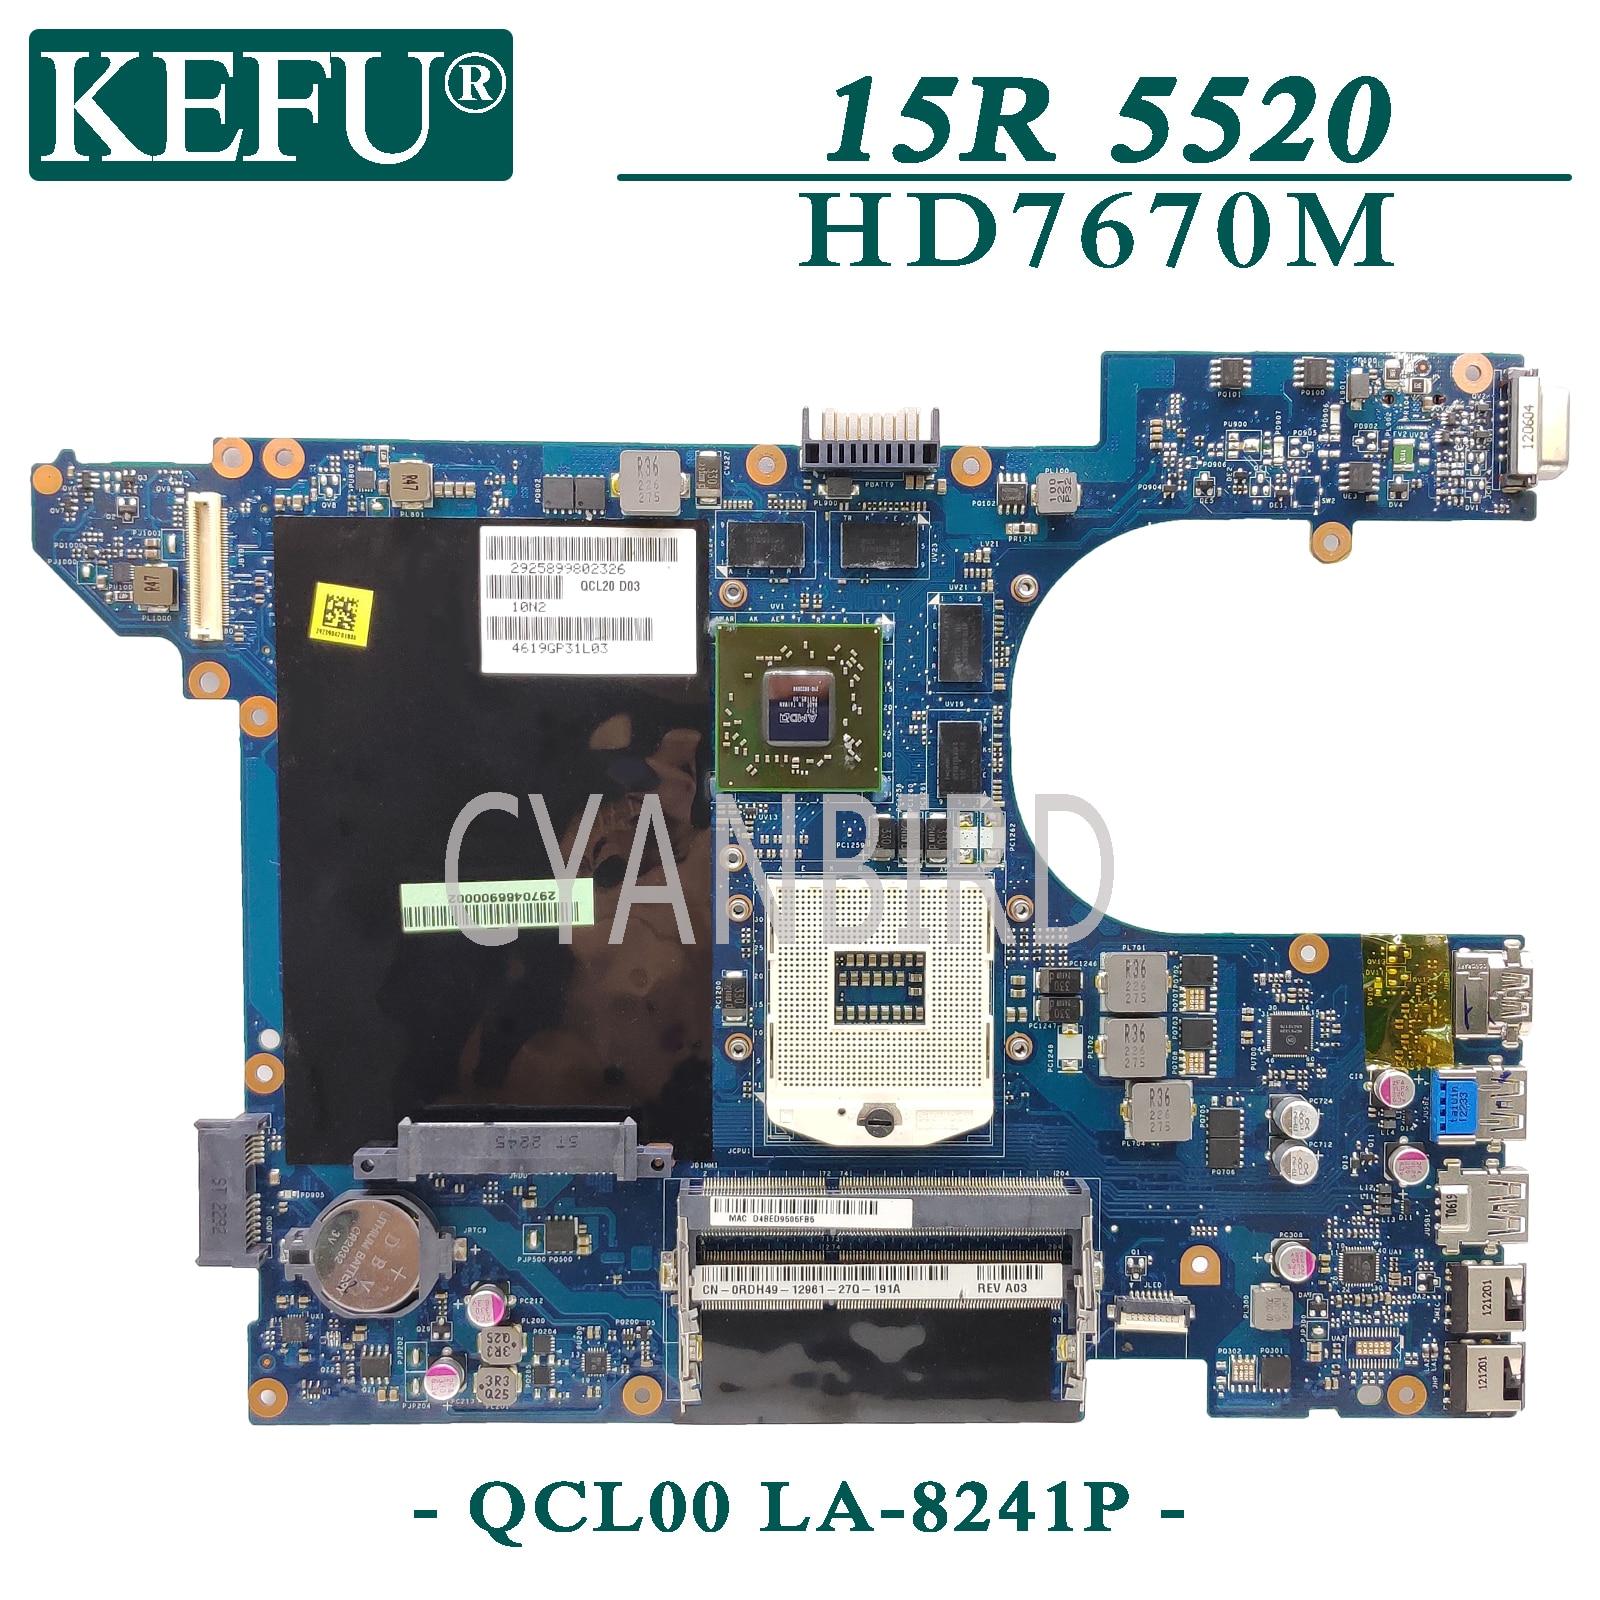 KEFU LA-8241P اللوحة الرئيسية الأصلية لأجهزة الكمبيوتر المحمول Dell Inspiron 15R-5520 7520 مع اللوحة الأم HD7670M